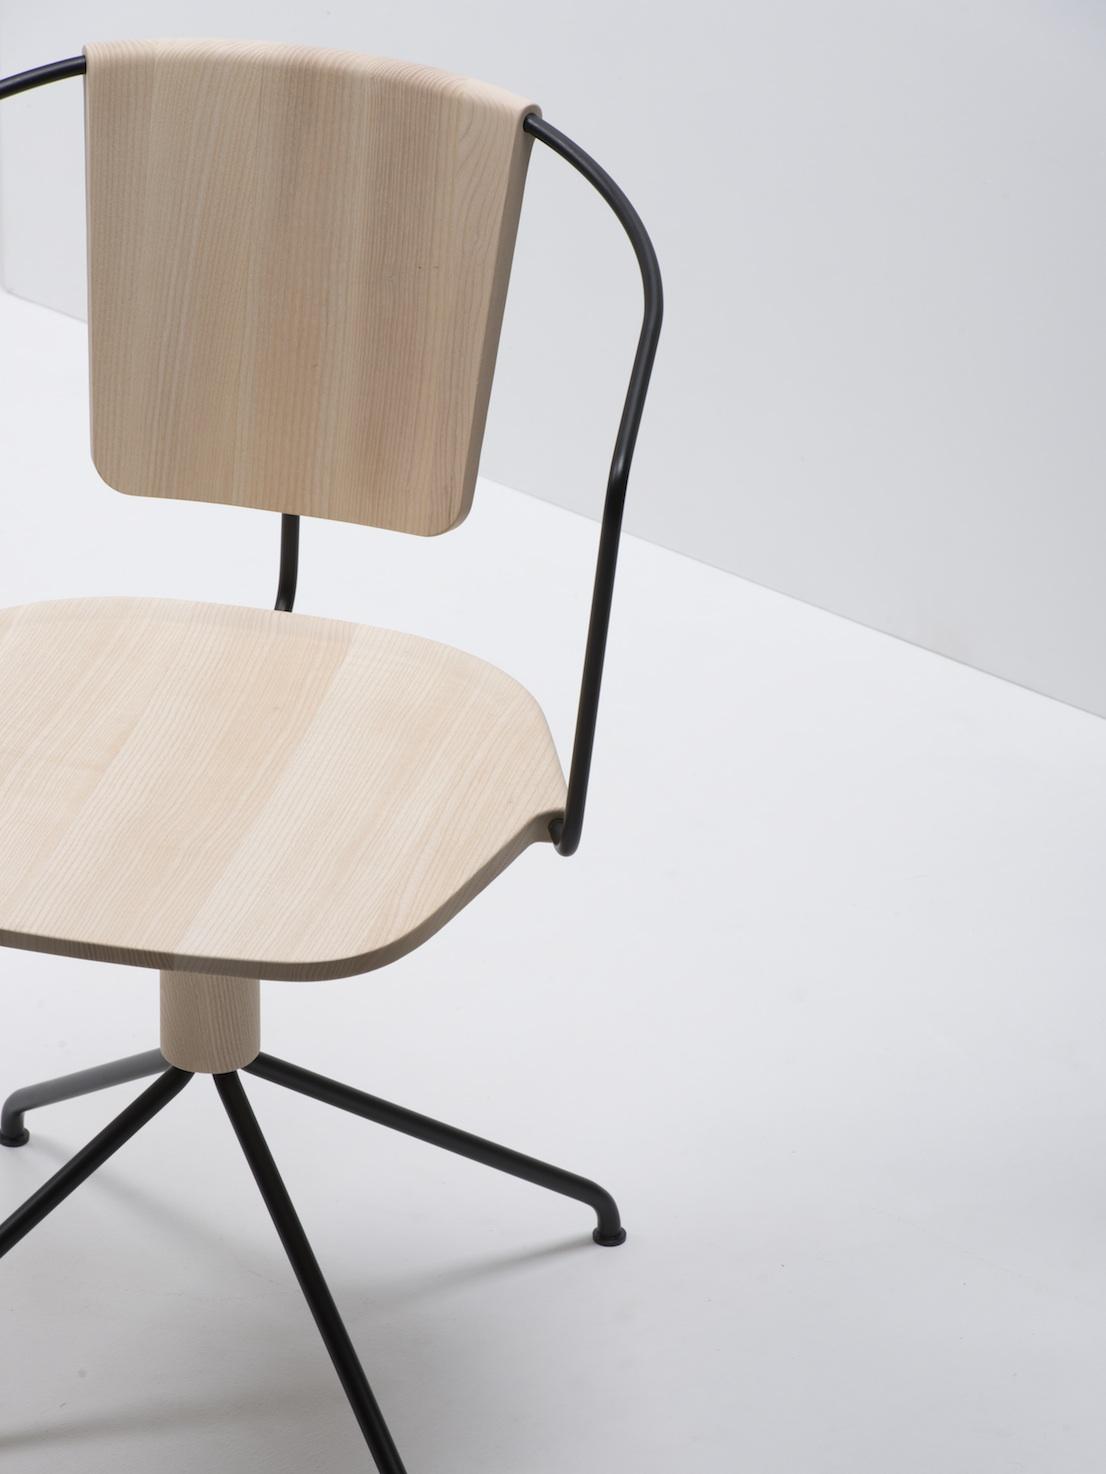 Uncino, design di Ronan e Erwan Bouroullec per Mattiazzi.